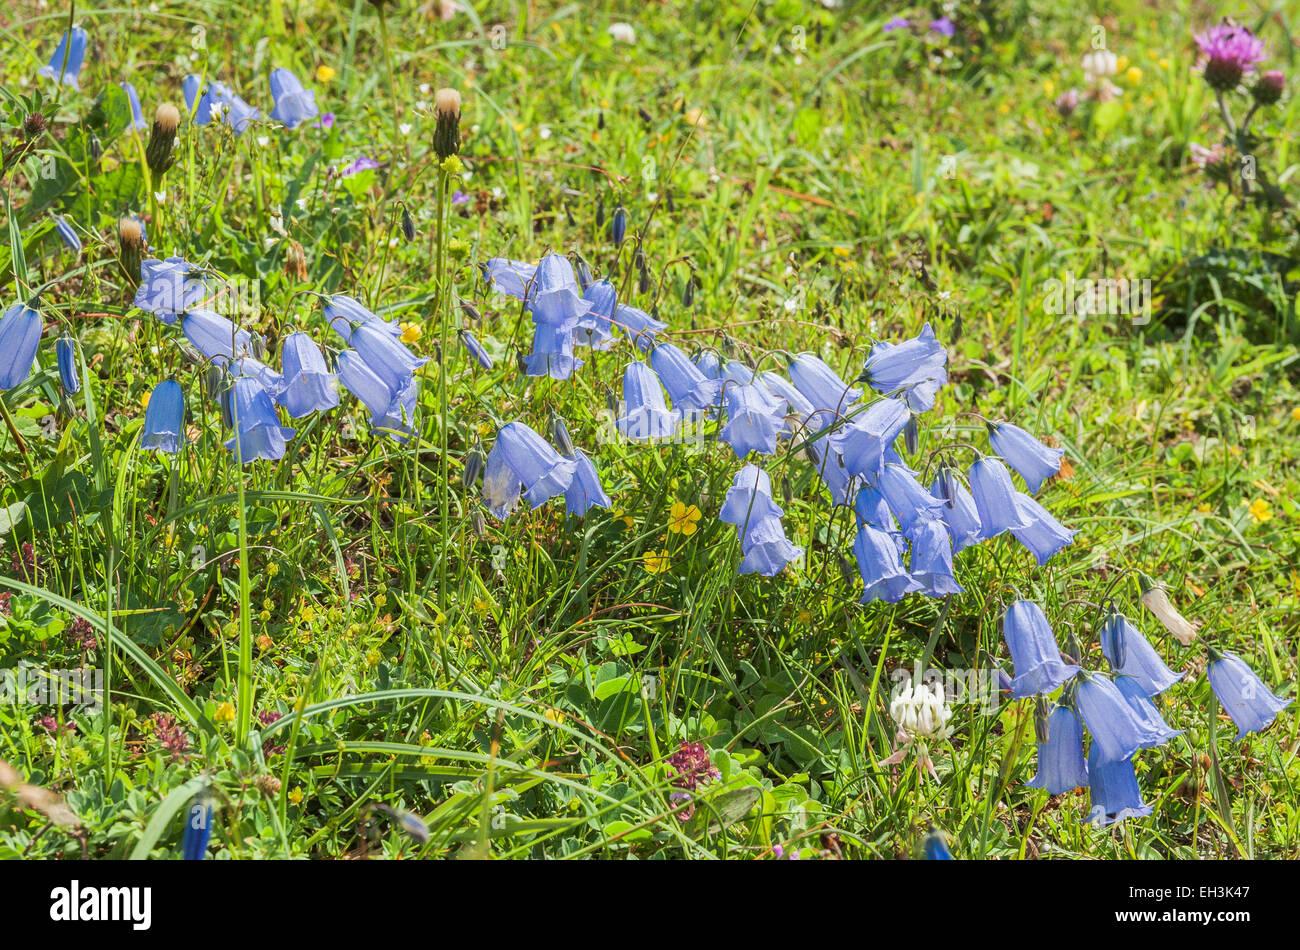 Fairies' thimbles (Campanula cochleariifolia), Mountain Meadow, Dolomites, Trentino-Alto Adige, Italy - Stock Image